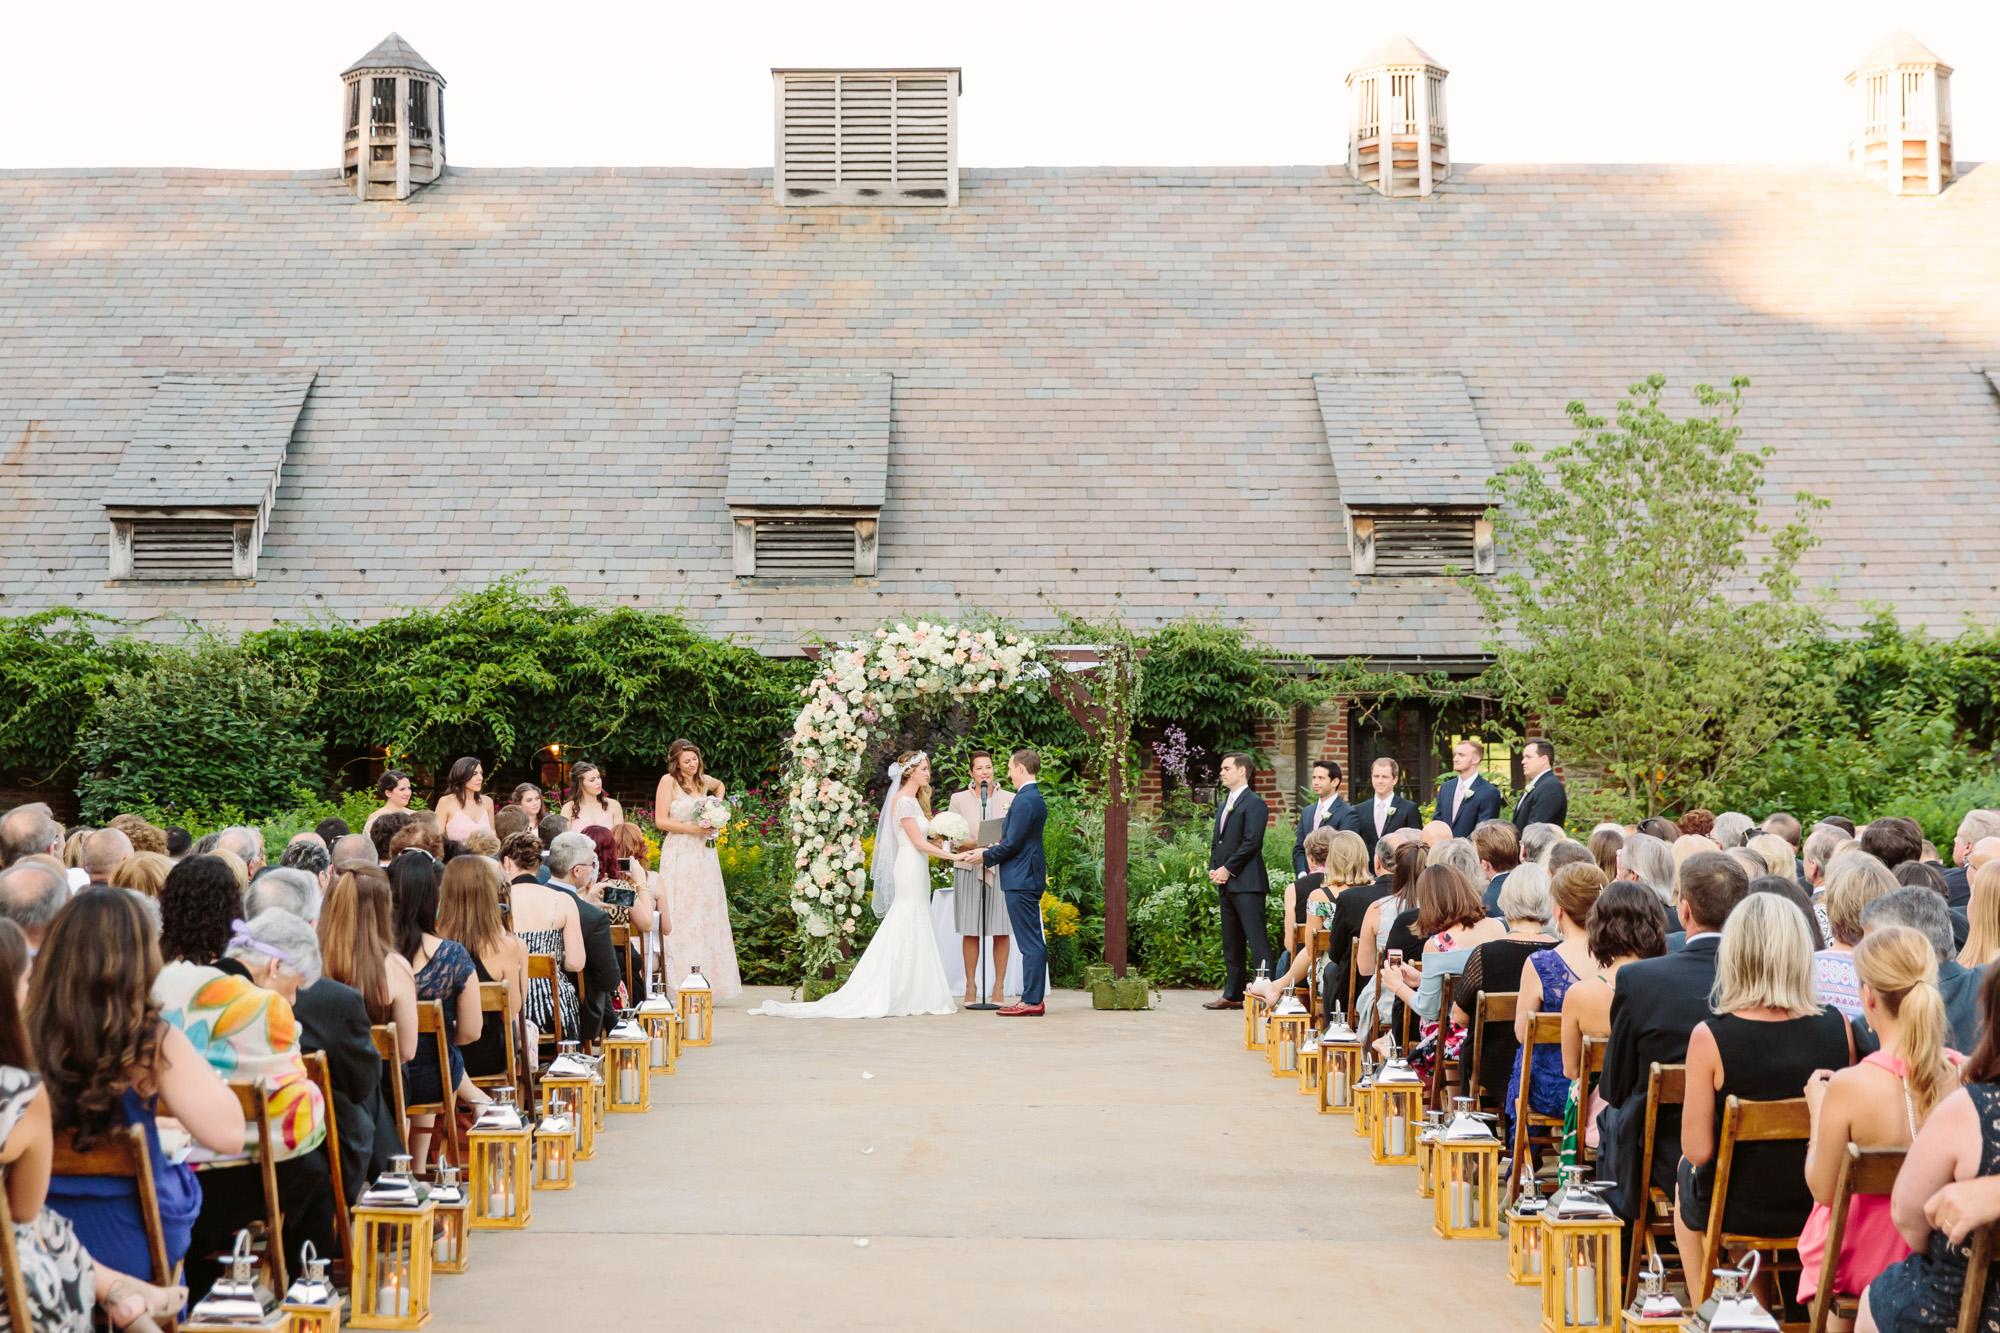 42_Jessica_Ted_Blue_Hill_Stone_Barns_Wedding_Pocantico_NY_Tanya_Salazar_Photography_120.jpg